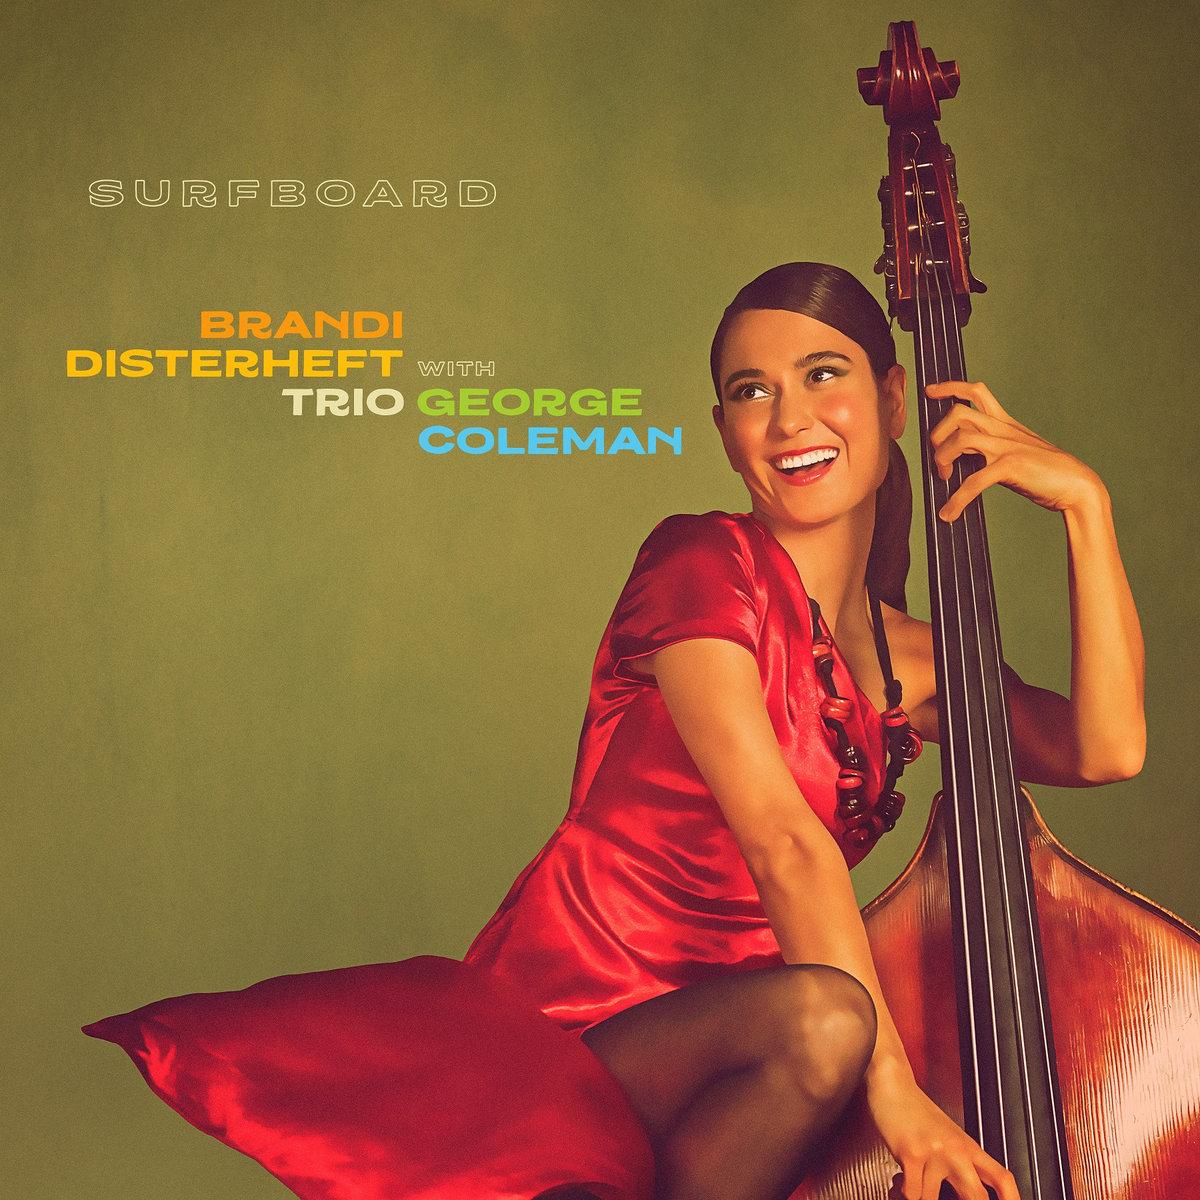 Brandi Disterheft Trio with George Coleman - Surfboard (2020) [FLAC] Download